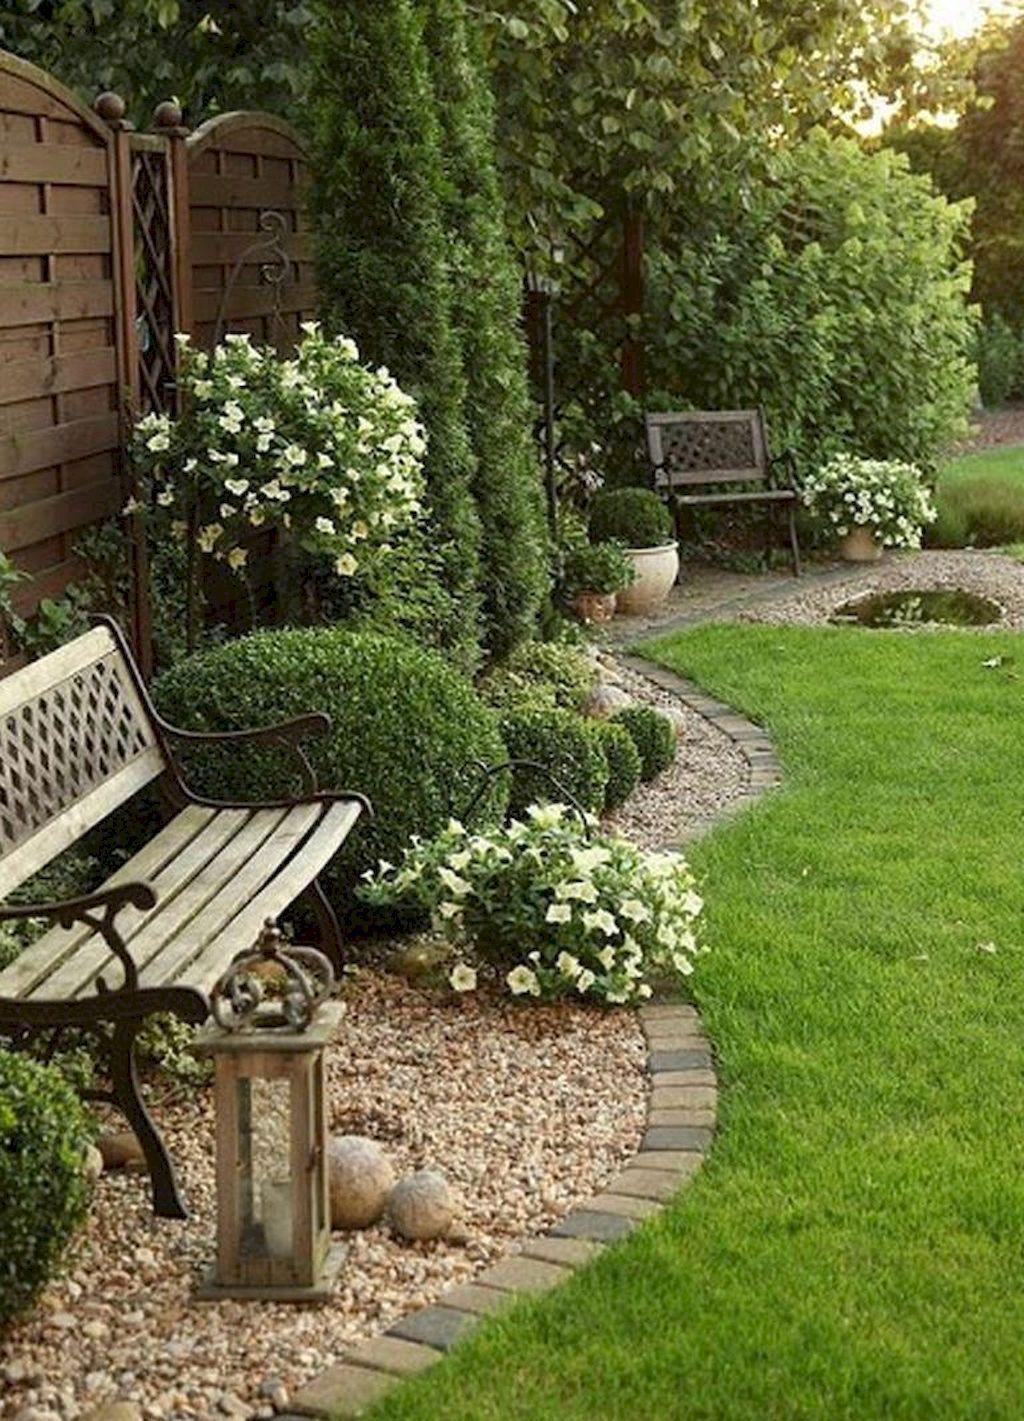 10+ Garden Ideen,  #BestGardenideasyards #Garden #Ideen